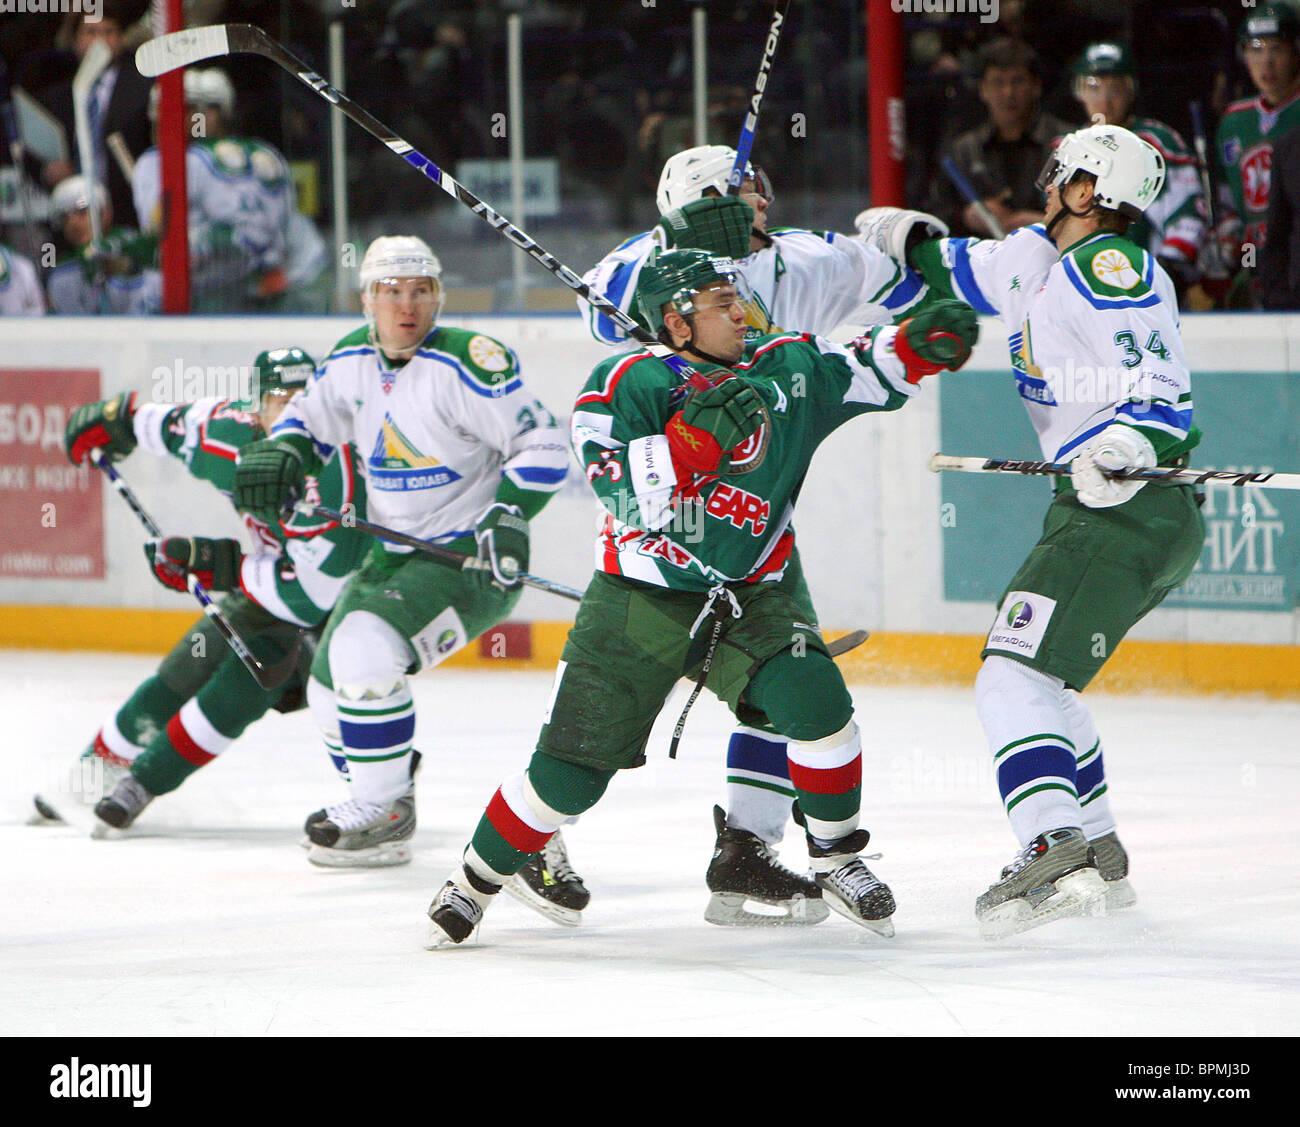 Who is Salavat Yulaev 30